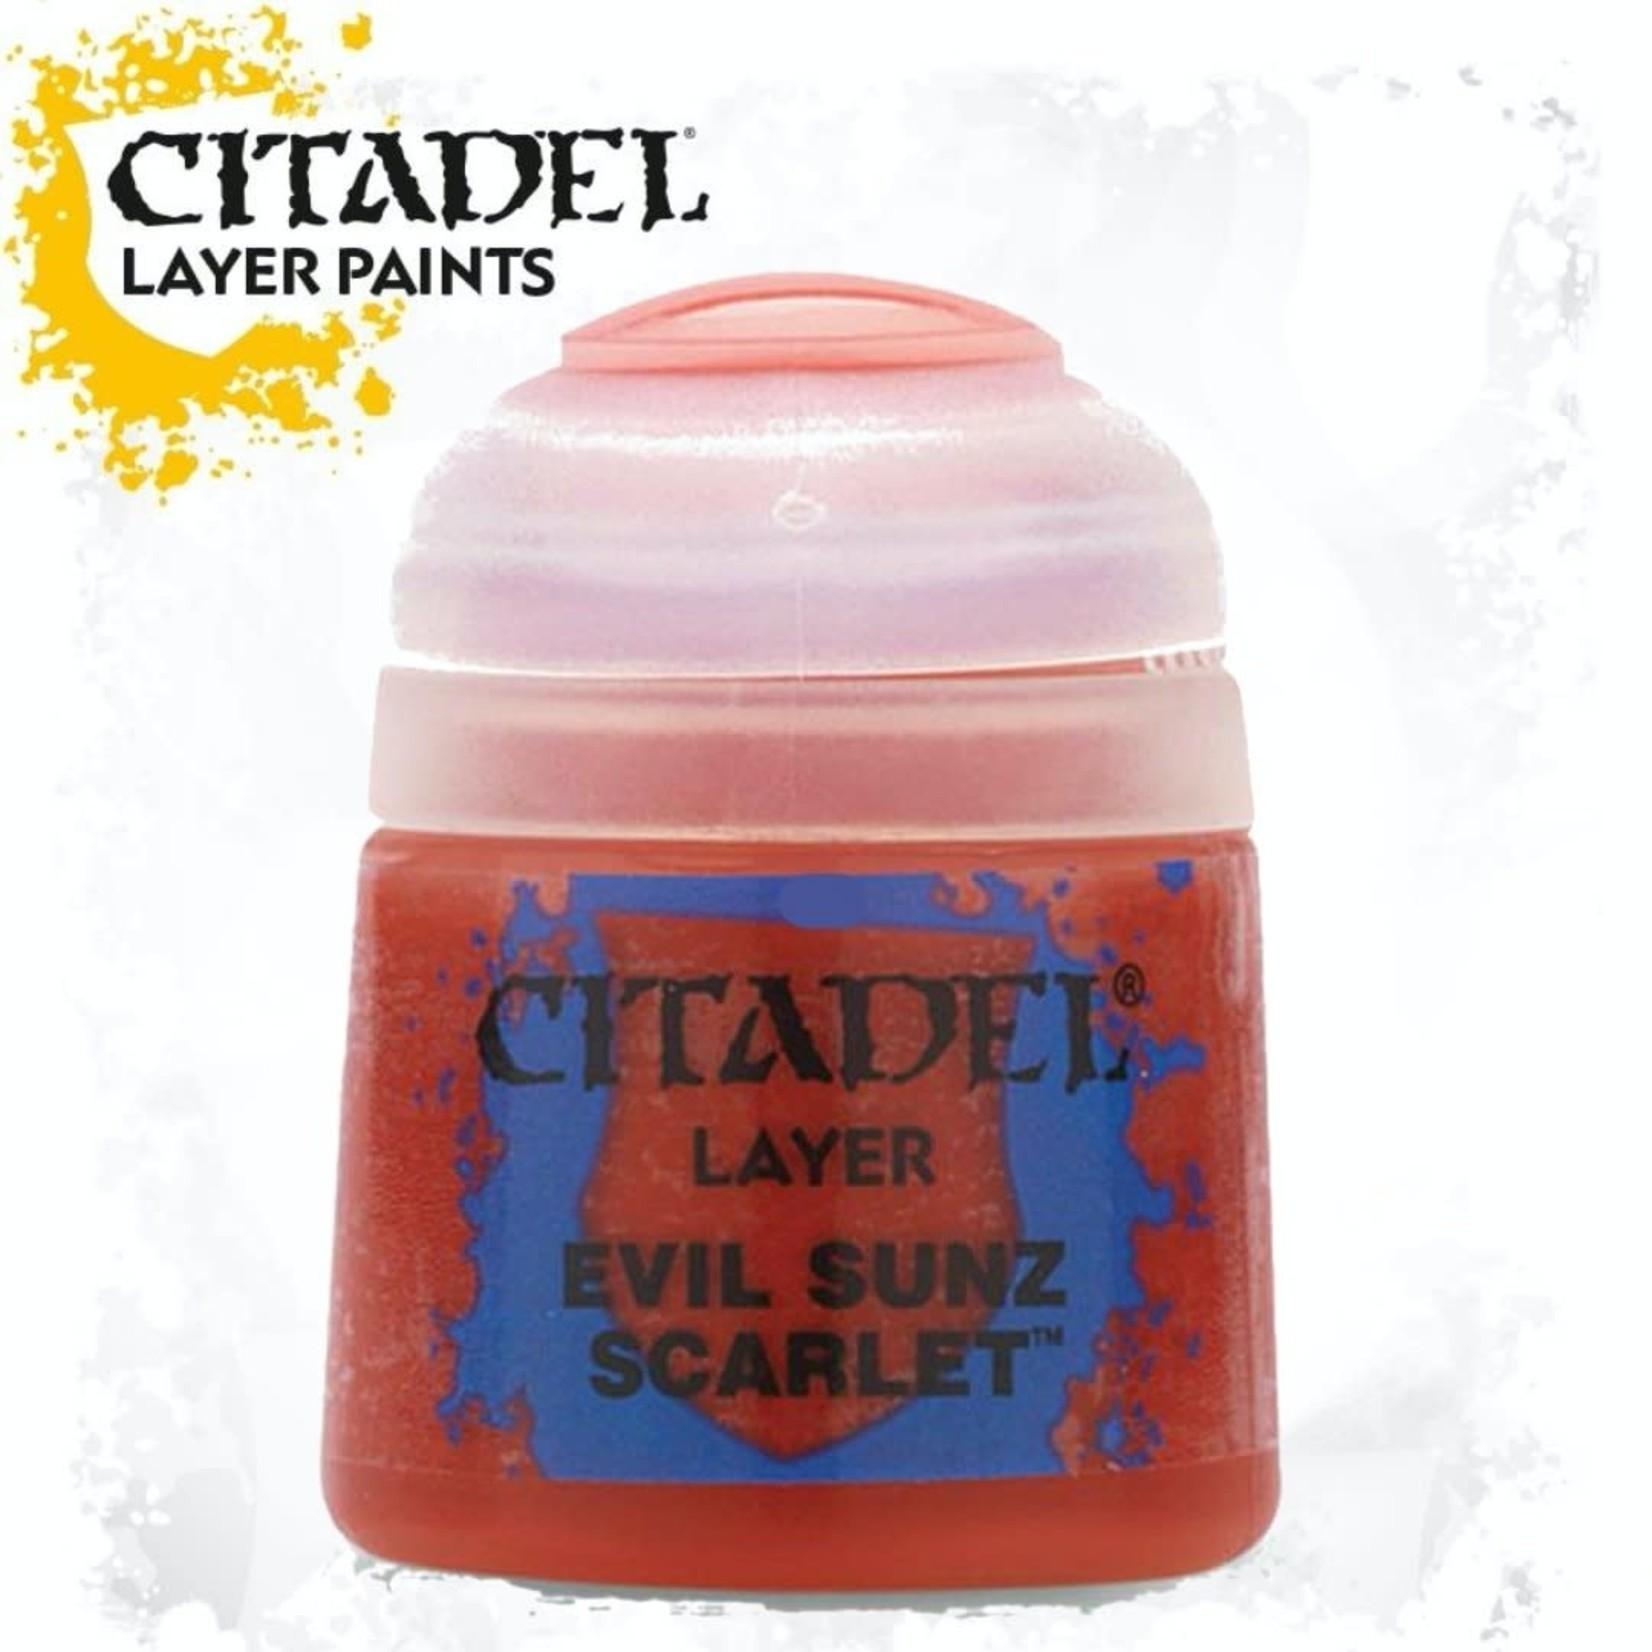 Citadel Citadel Paint - Layer: Evil Sunz Scarlet